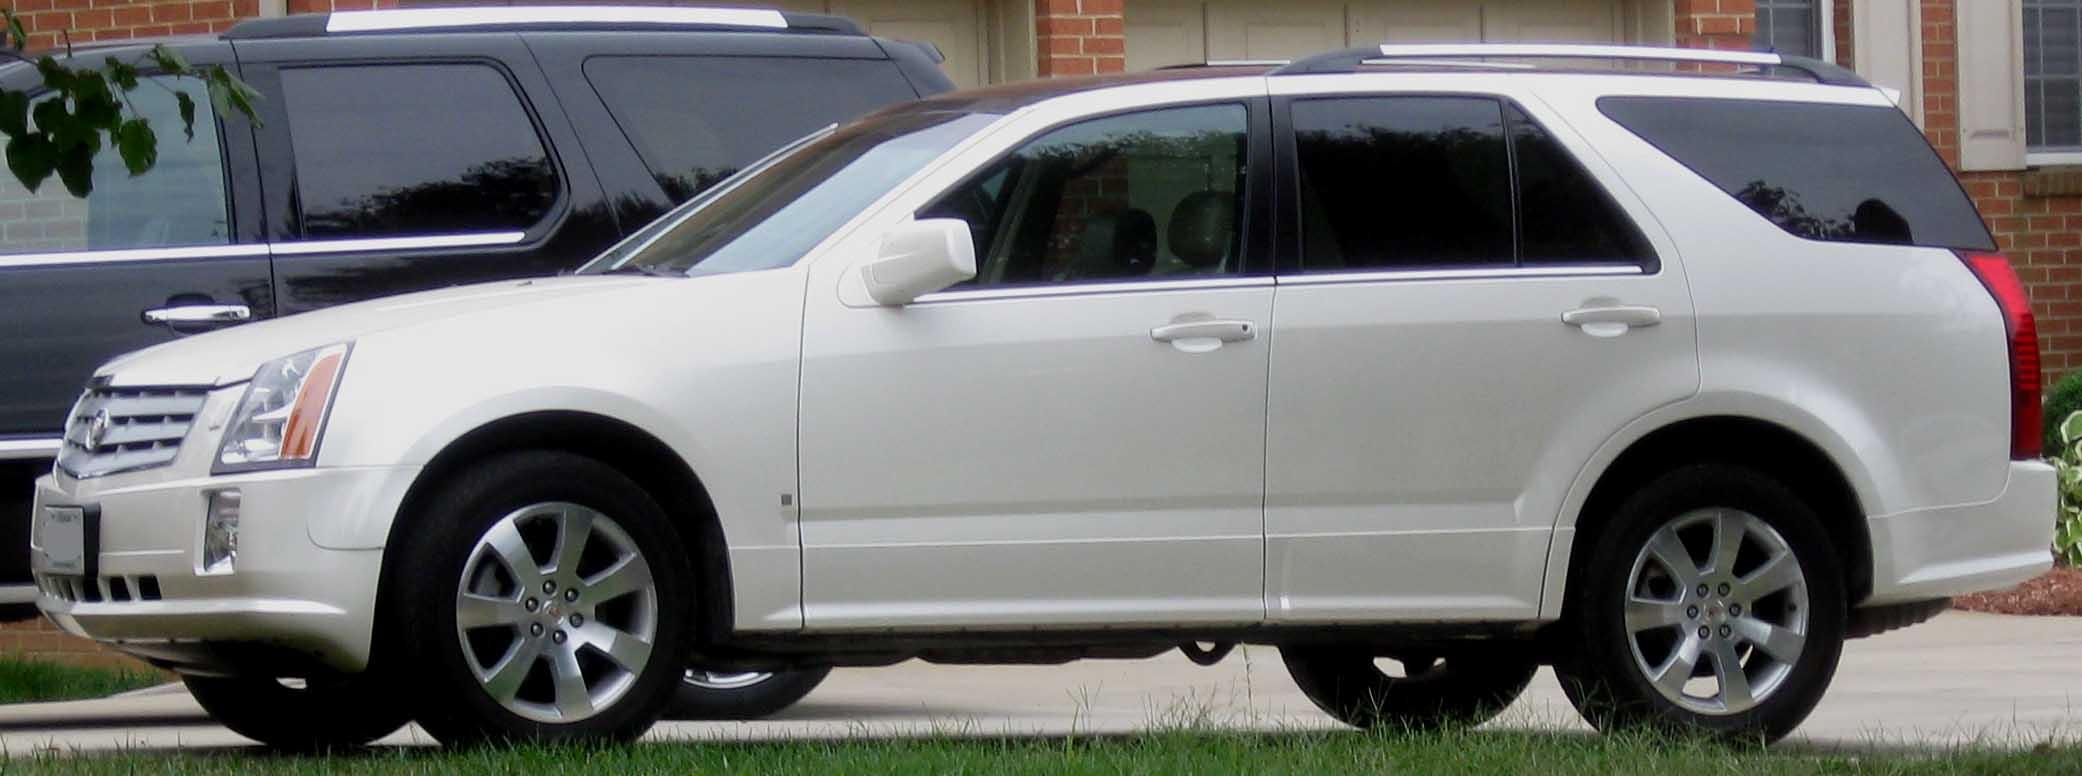 File:Cadillac SRX .jpg - Wikimedia Commons